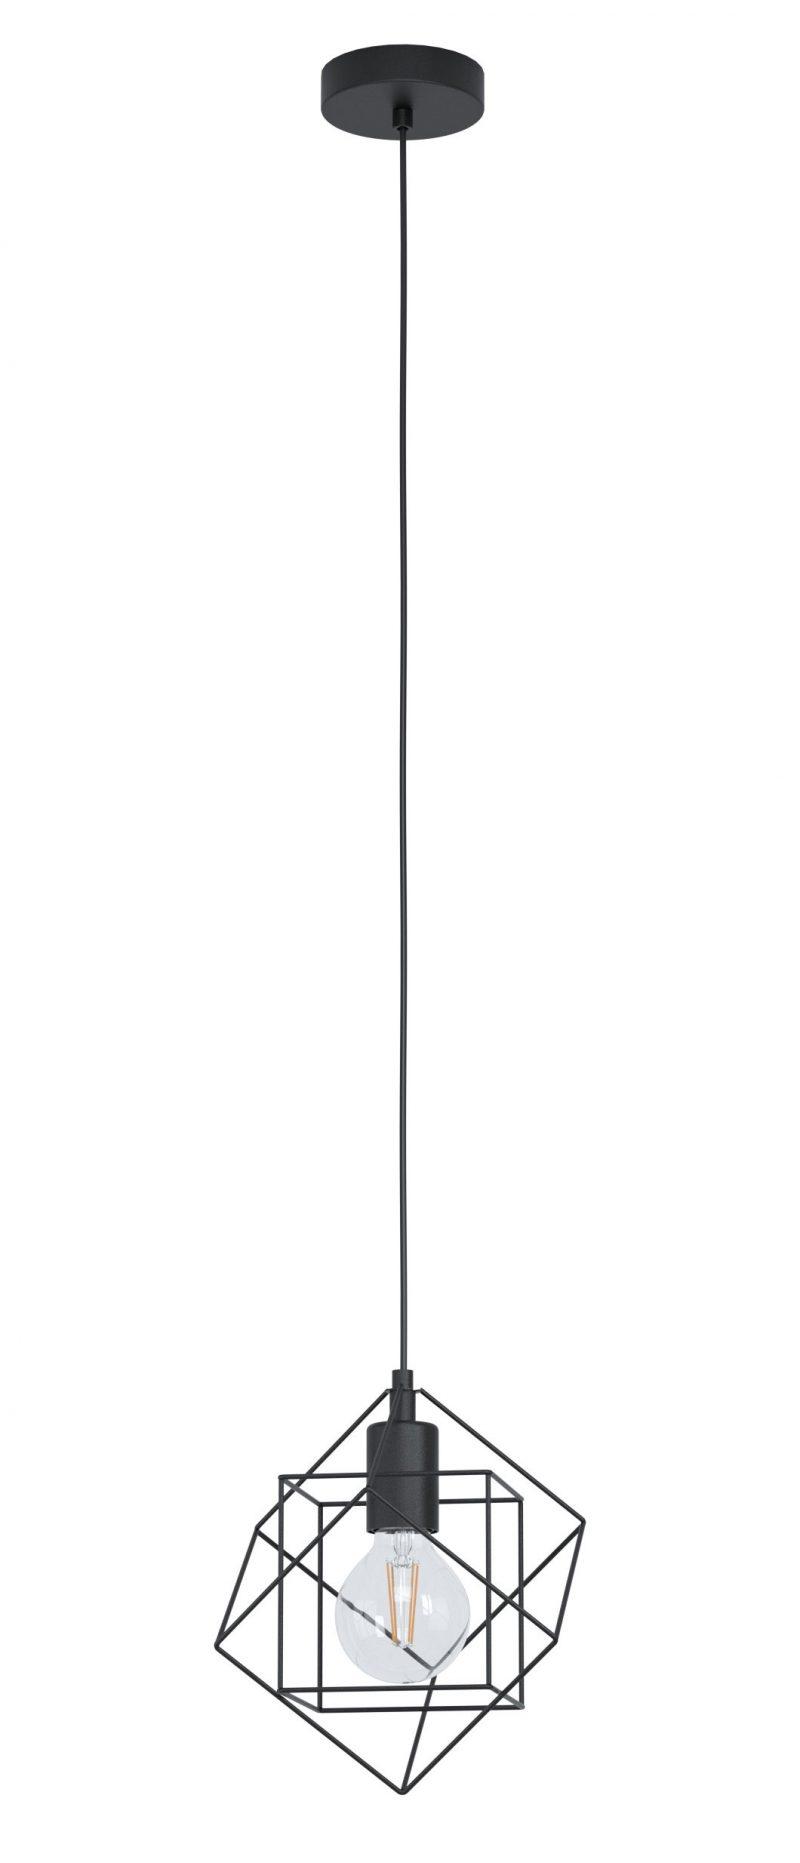 Lámpara colgante cubos 24 cm Straiton